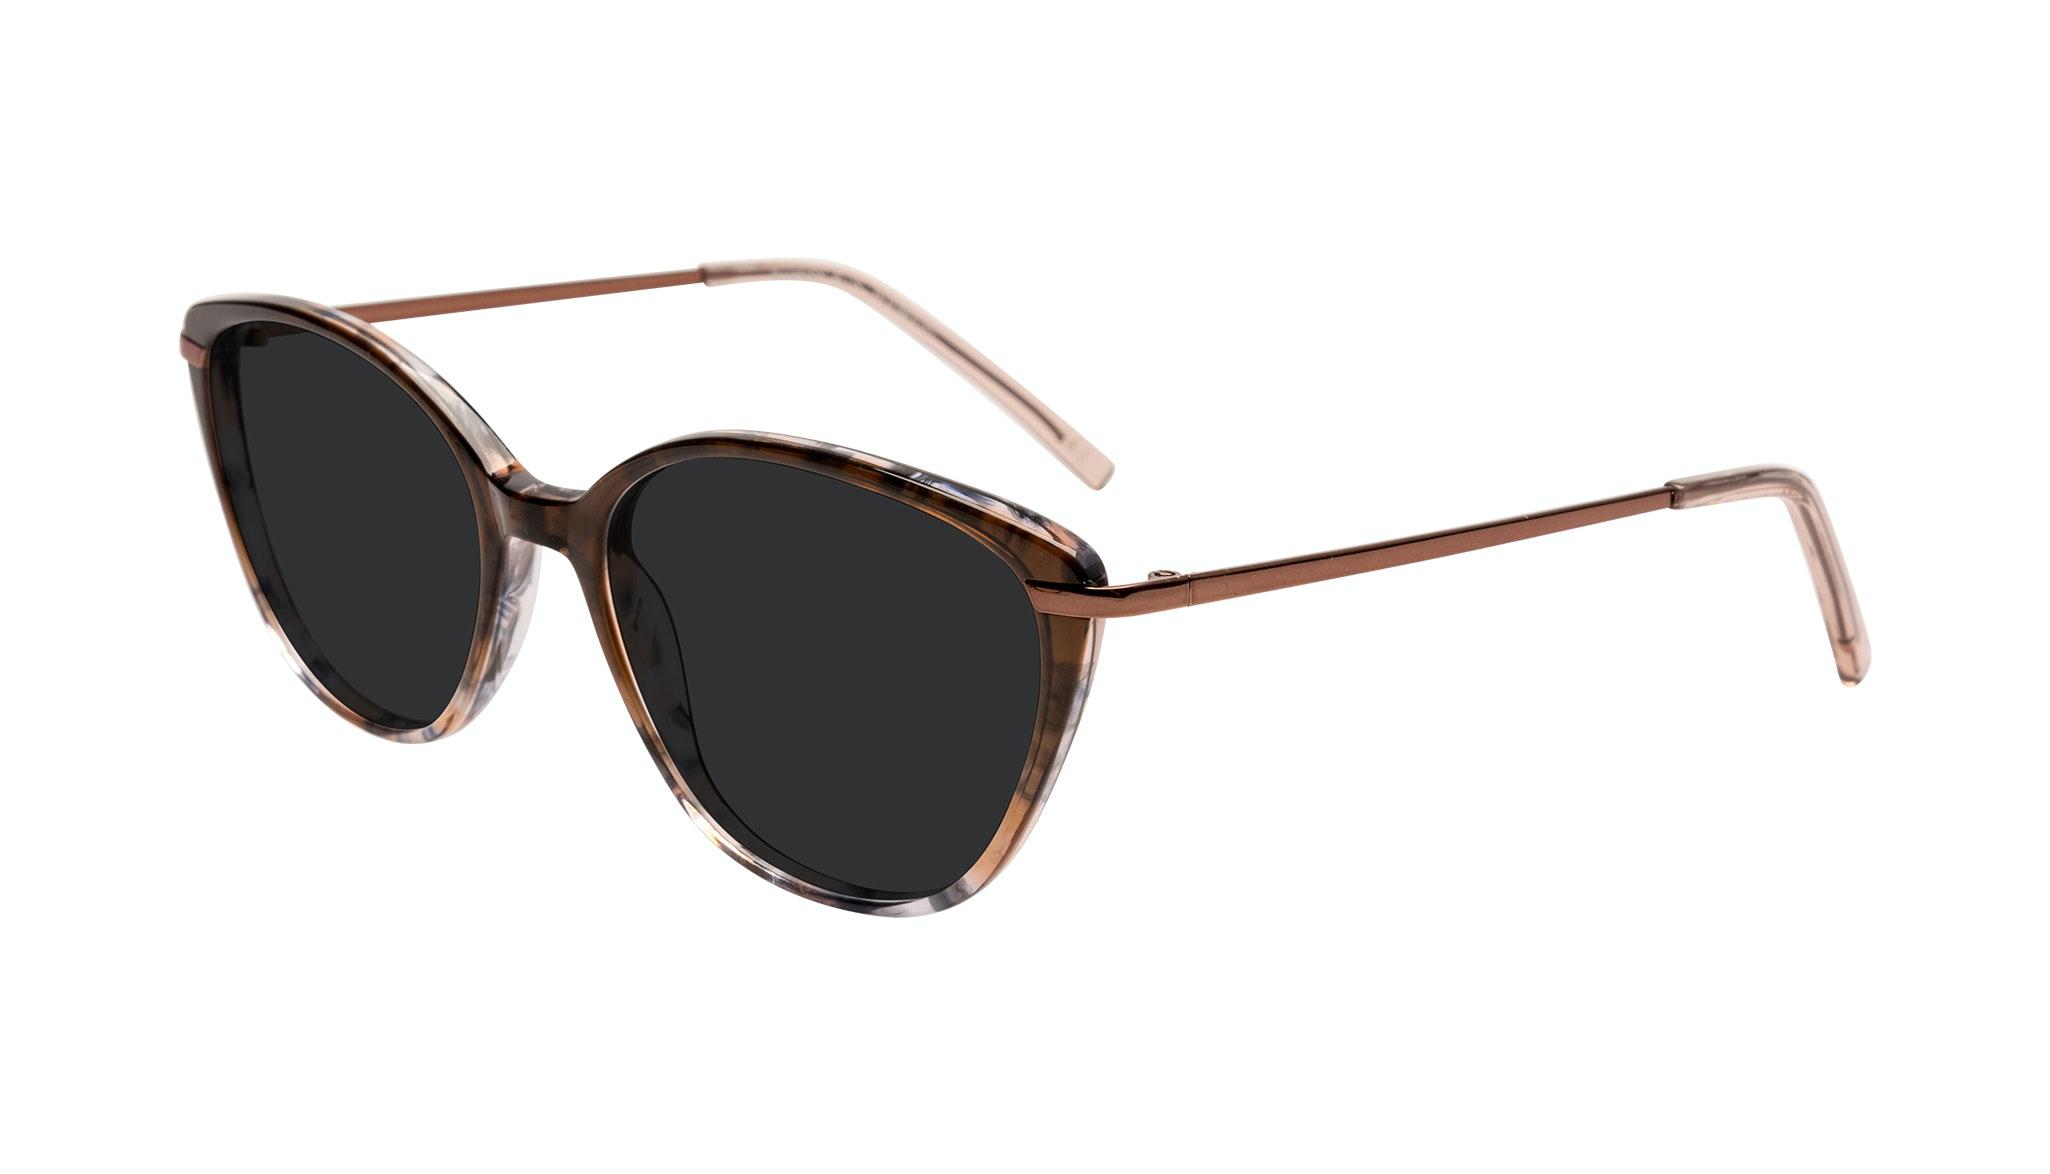 Affordable Fashion Glasses Cat Eye Sunglasses Women Illusion Plus Moondust Tilt